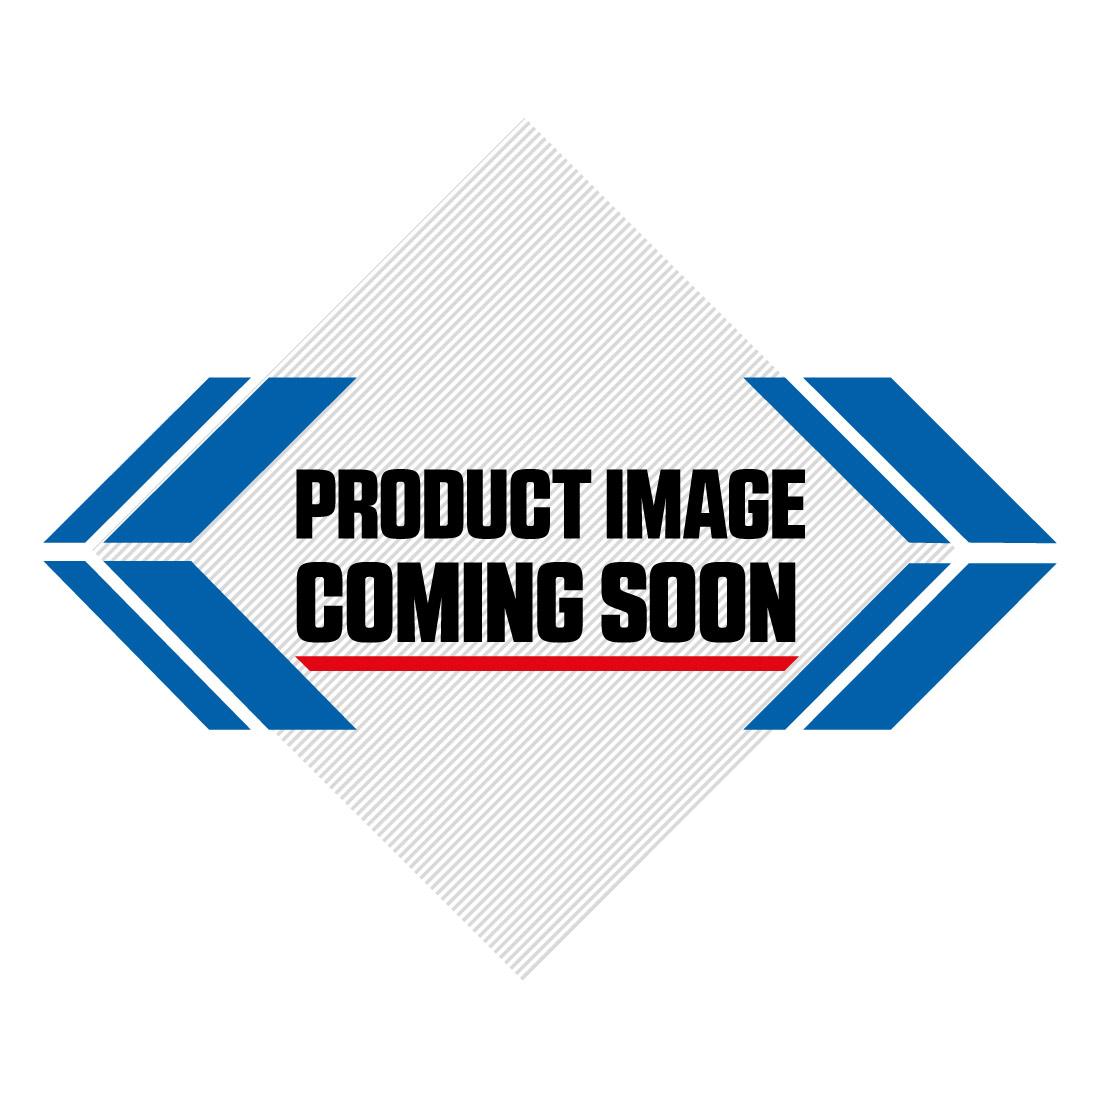 Suzuki Restyled Plastic Kit Suzuki RM 85 (00-17) Black Image-5